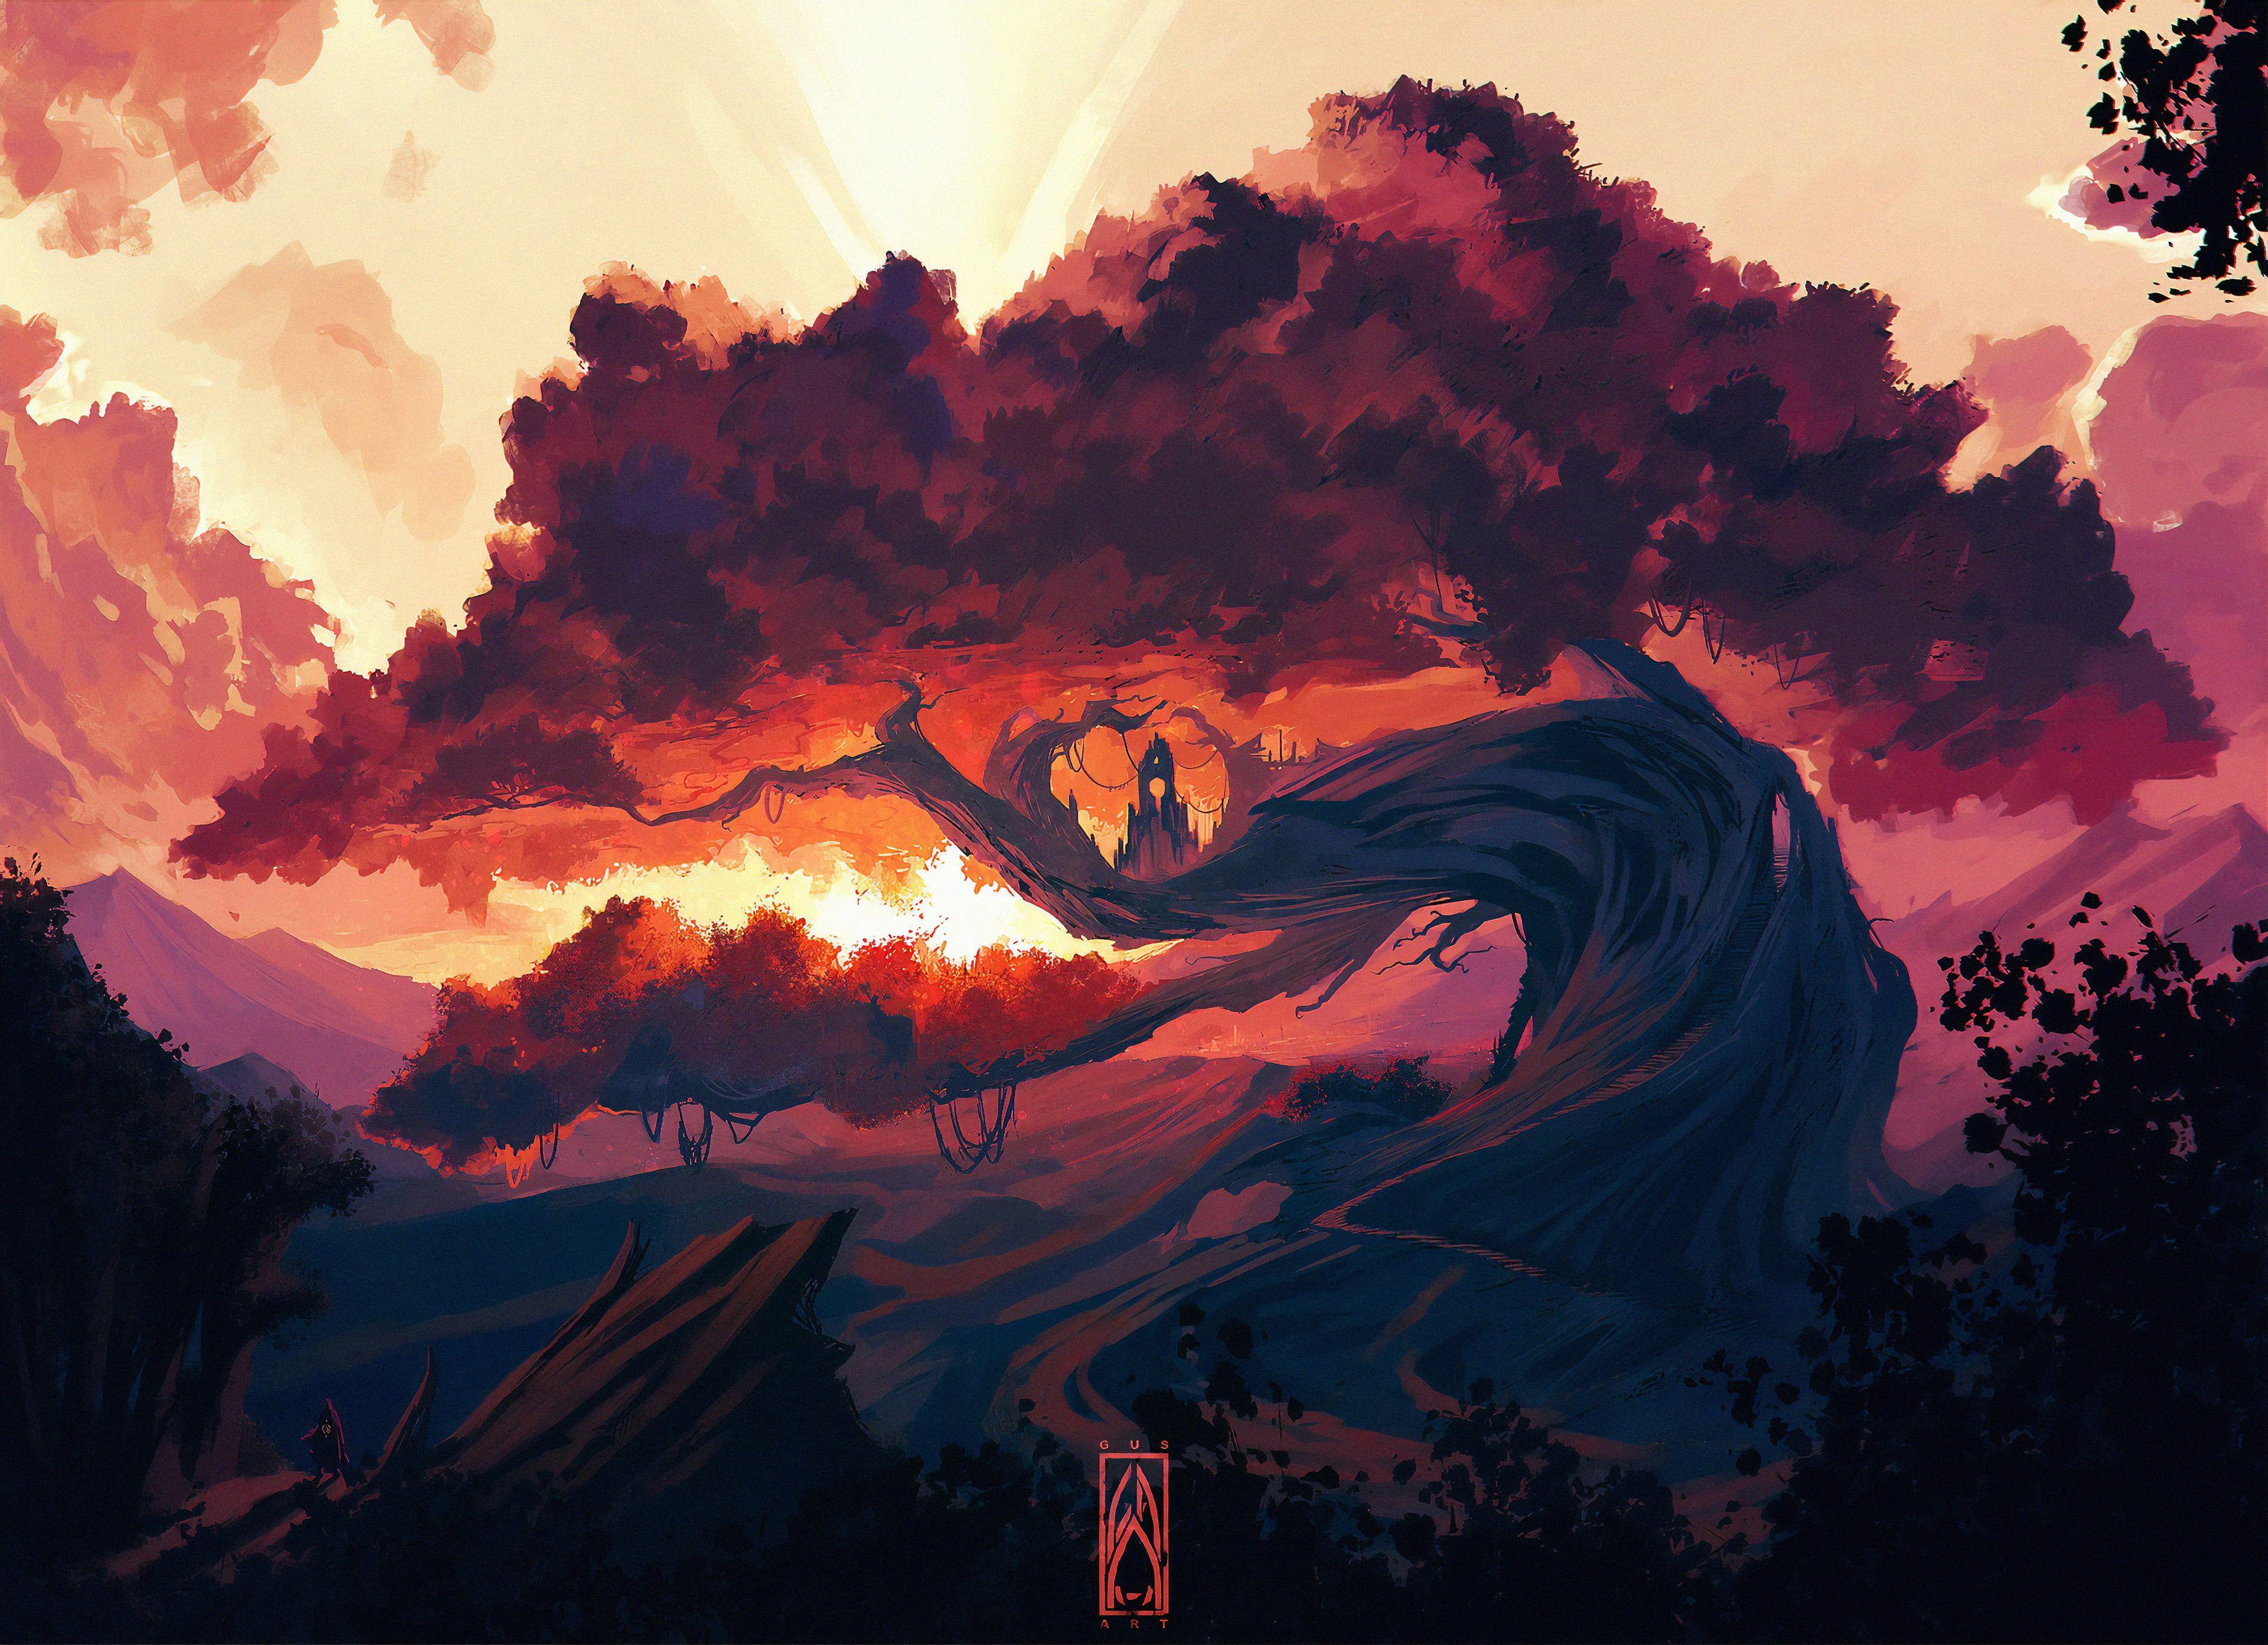 Fondo De Arbol Rosa Para Pc In 2020 Digital Painting Fantasy Landscape Fantasy Art